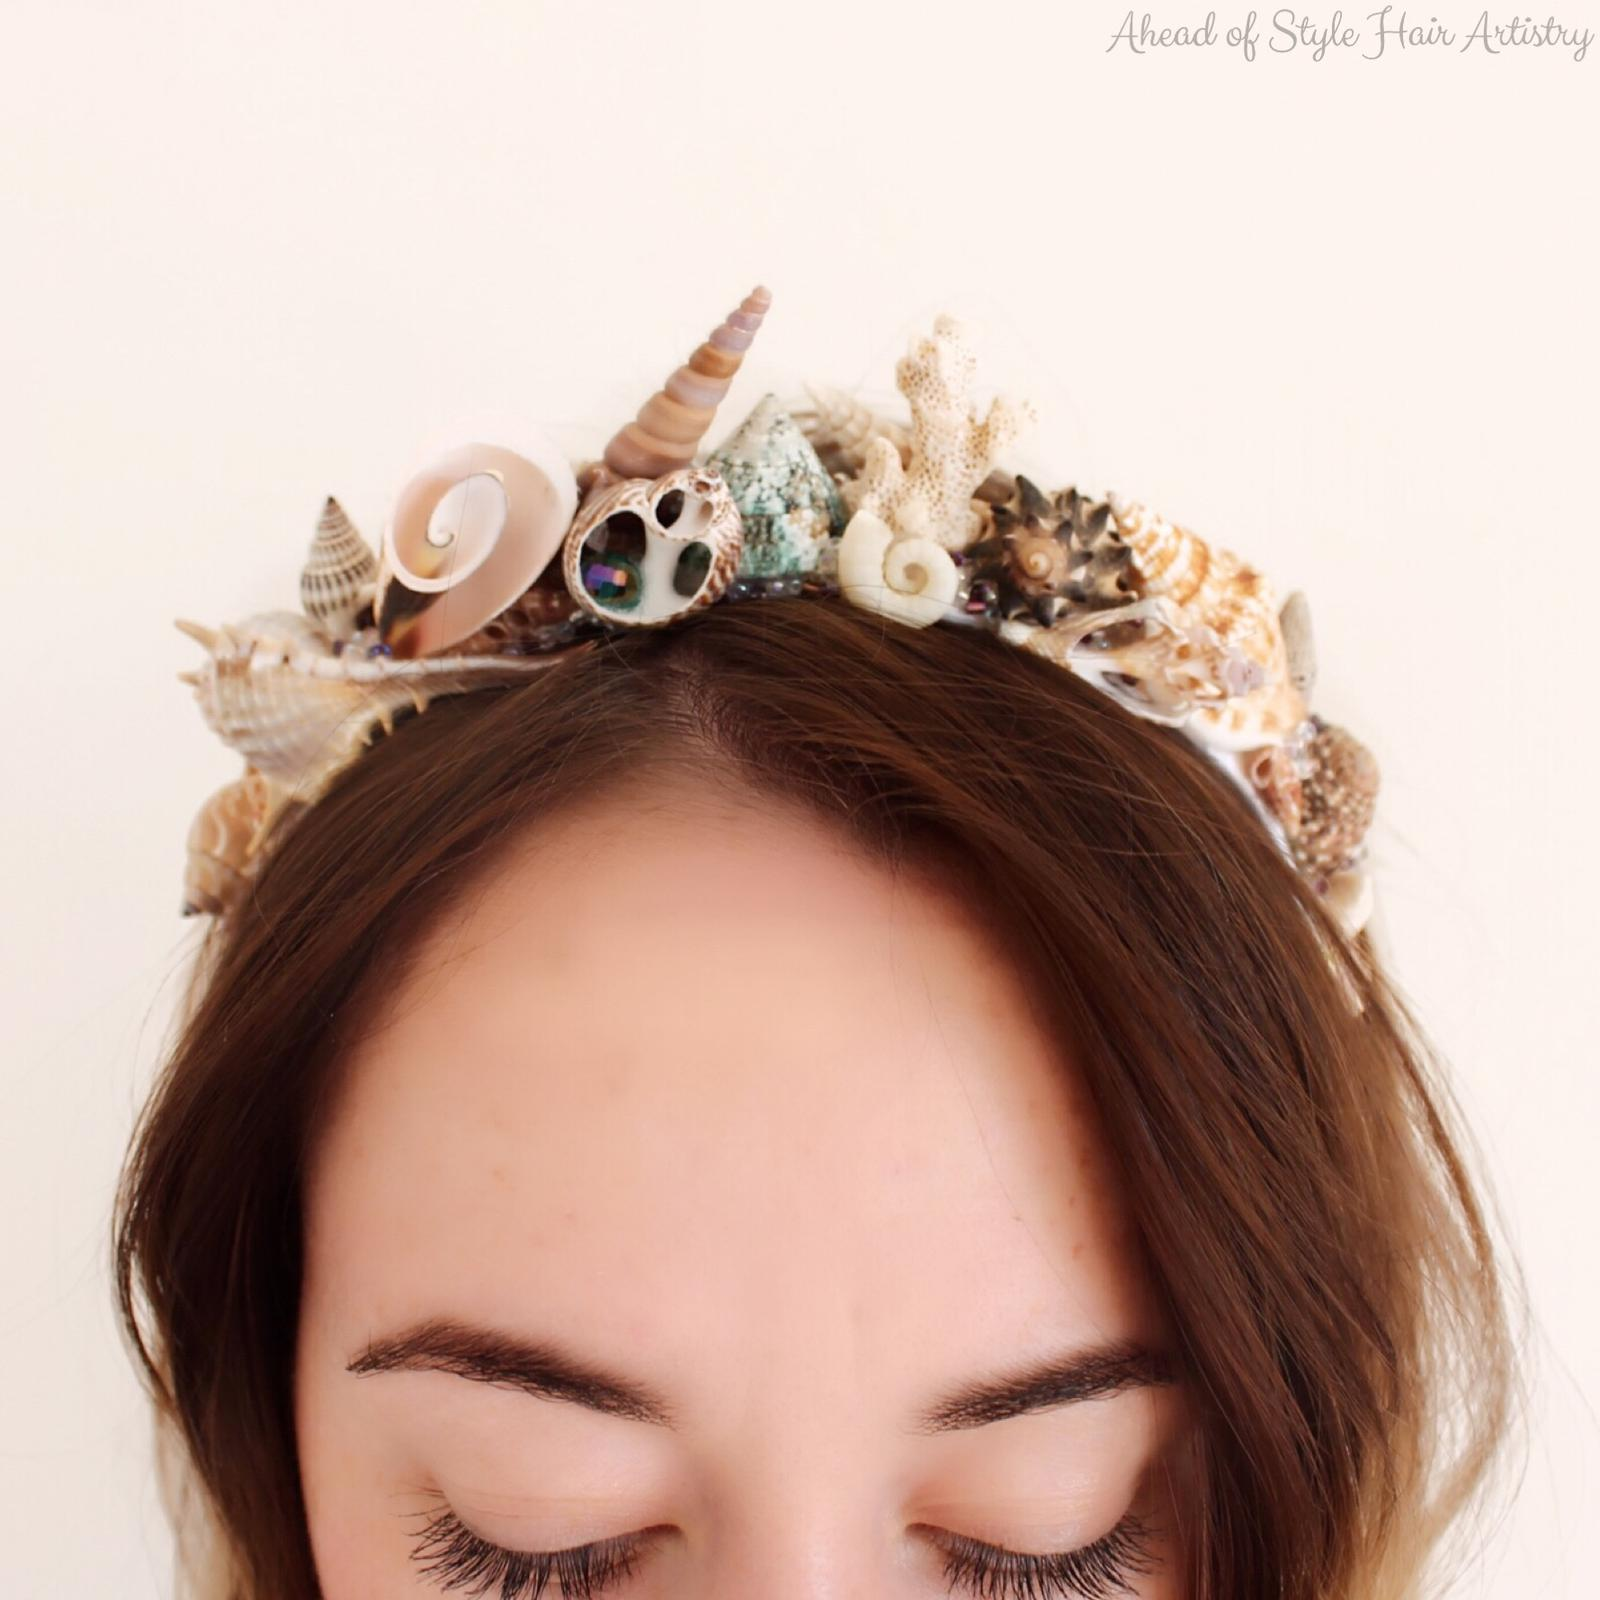 Seabed Headband